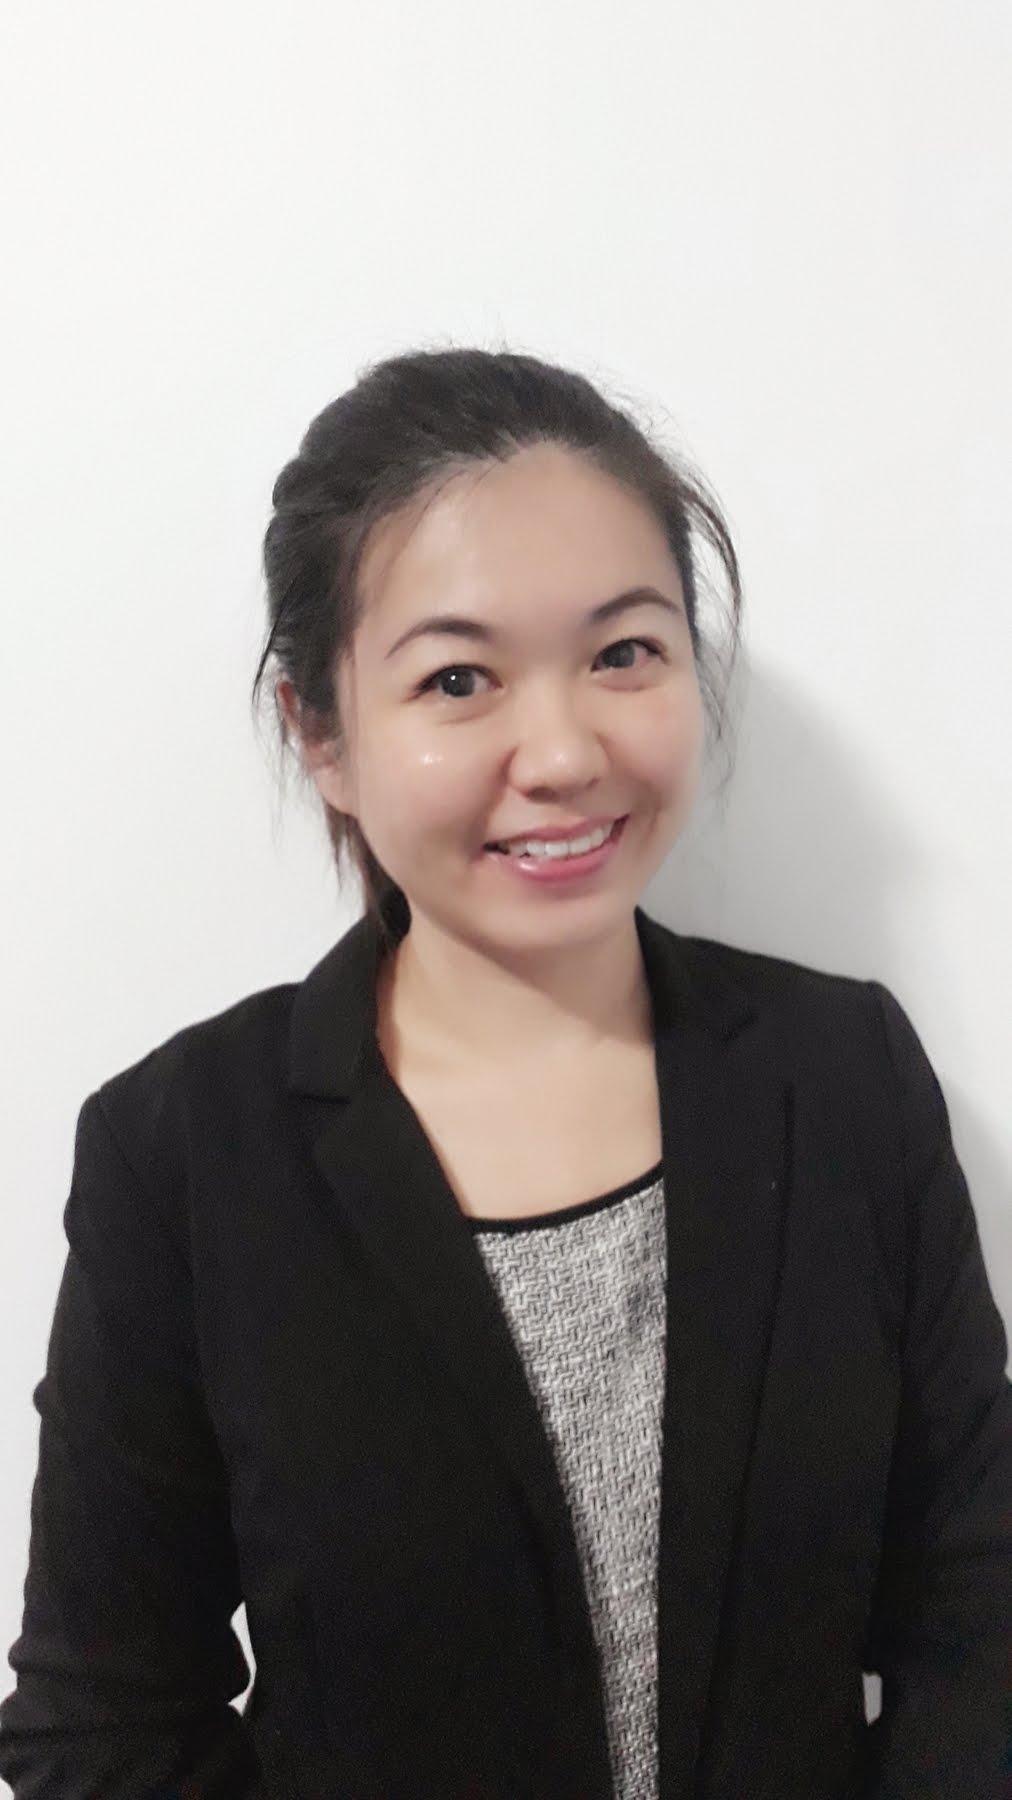 Michelle Phua